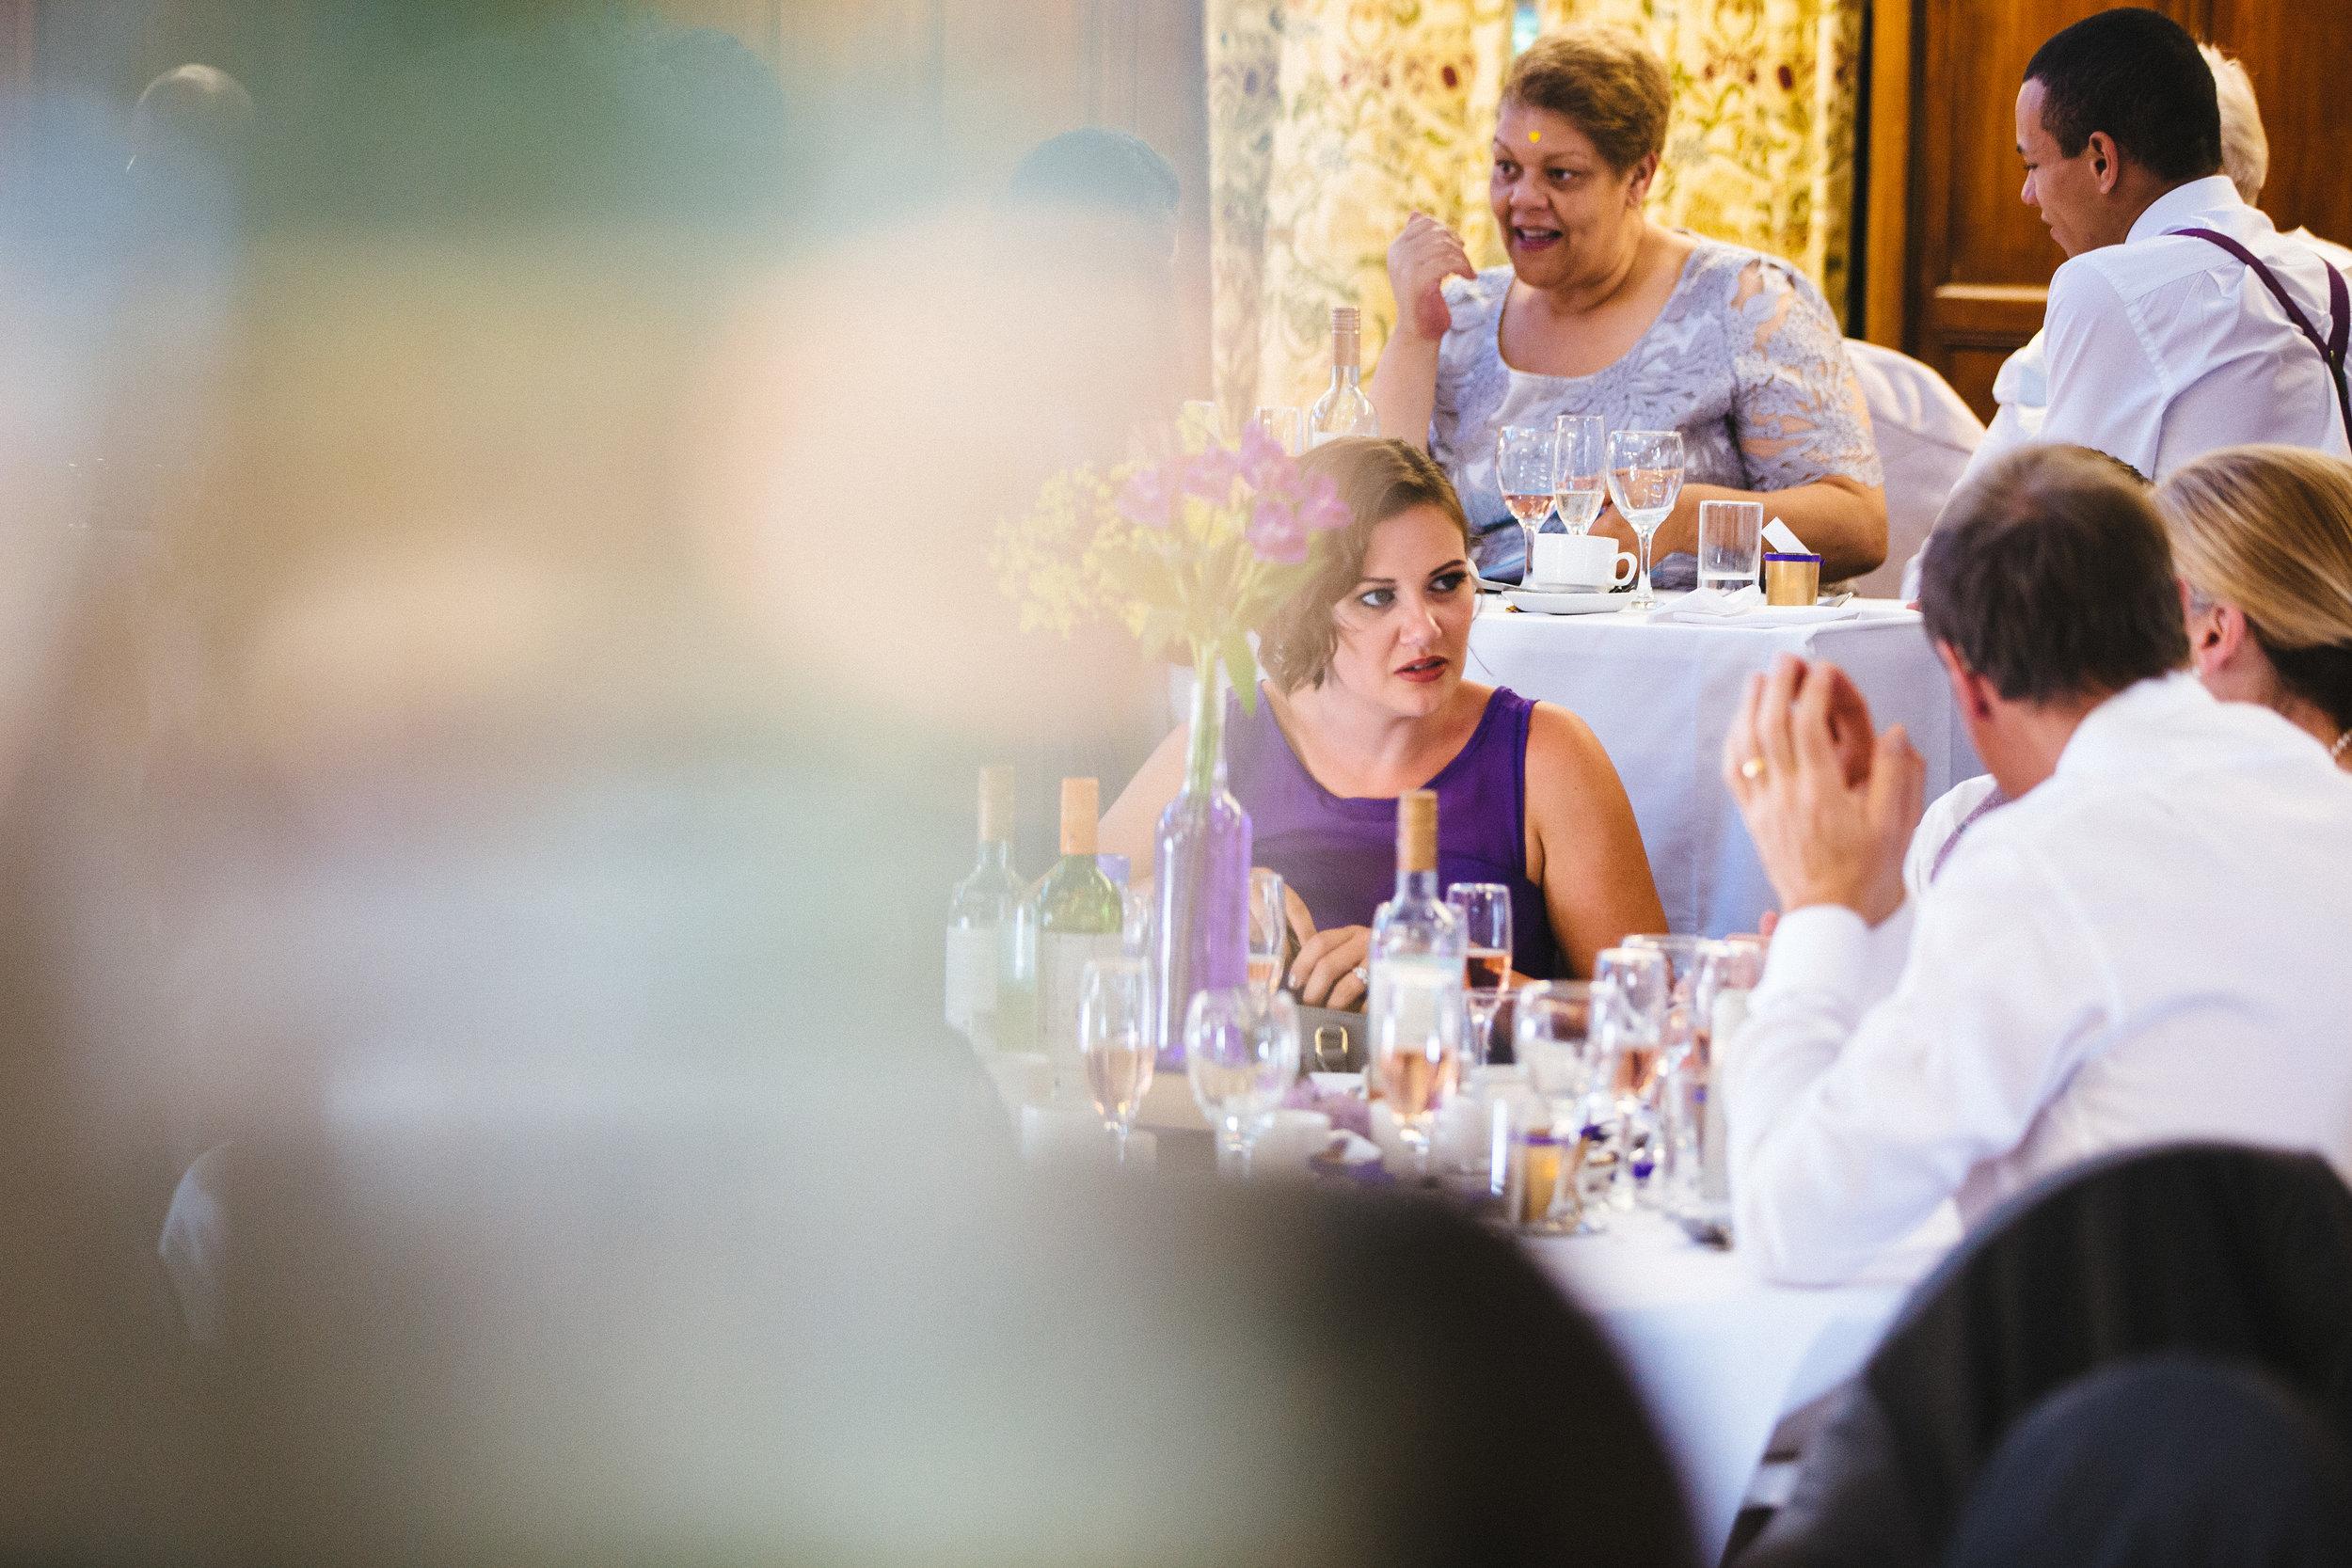 Saint-Alfege-Church-greenwich-wedding-charlton-house-speech-326